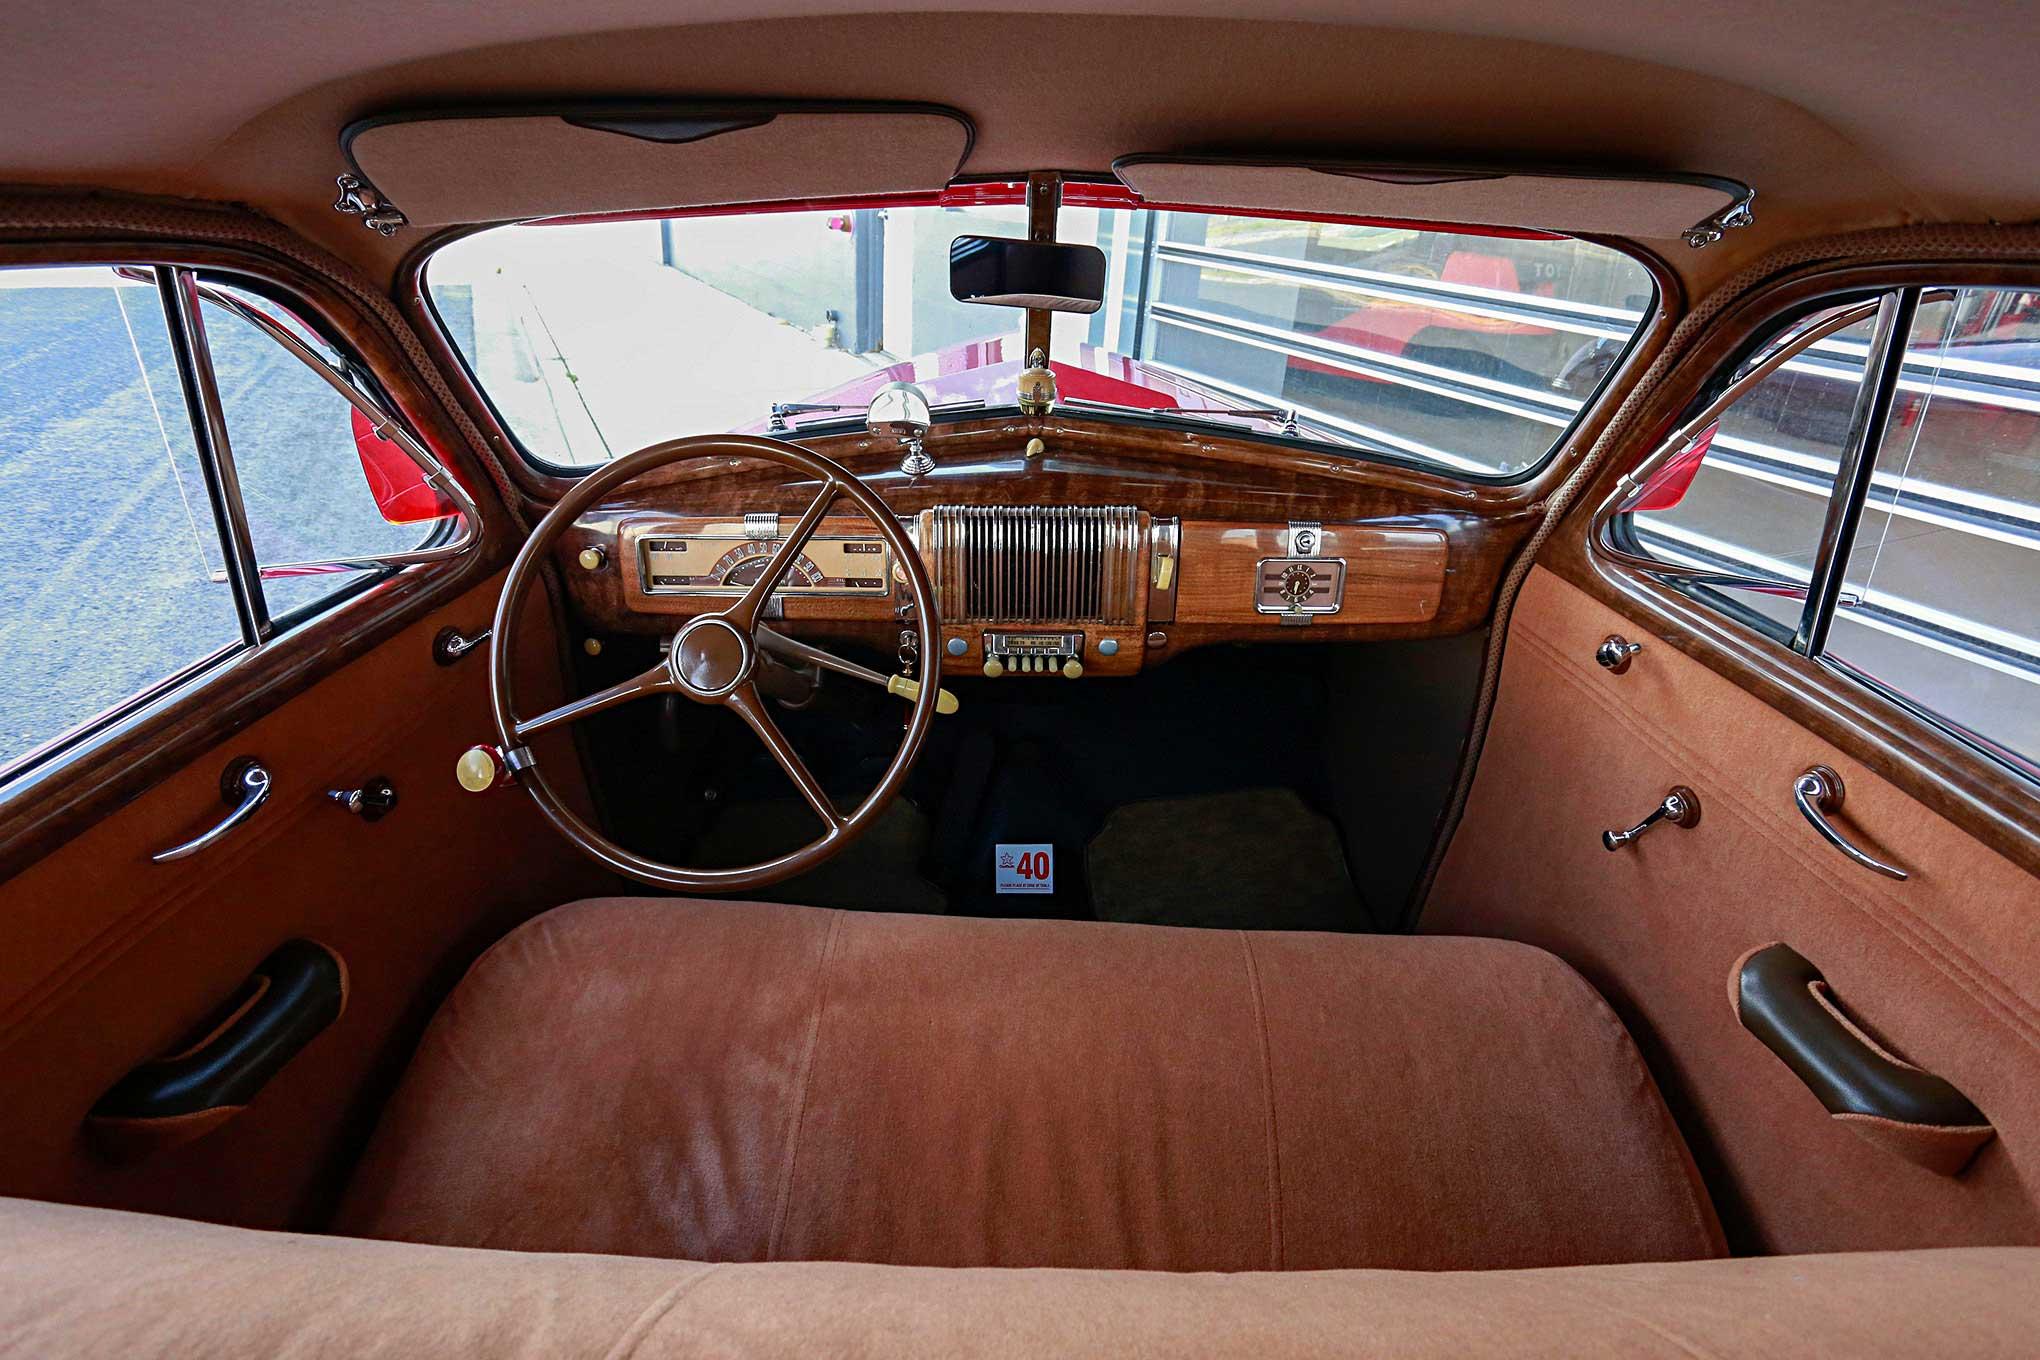 1940 chevrolet master deluxe interior lowrider. Black Bedroom Furniture Sets. Home Design Ideas